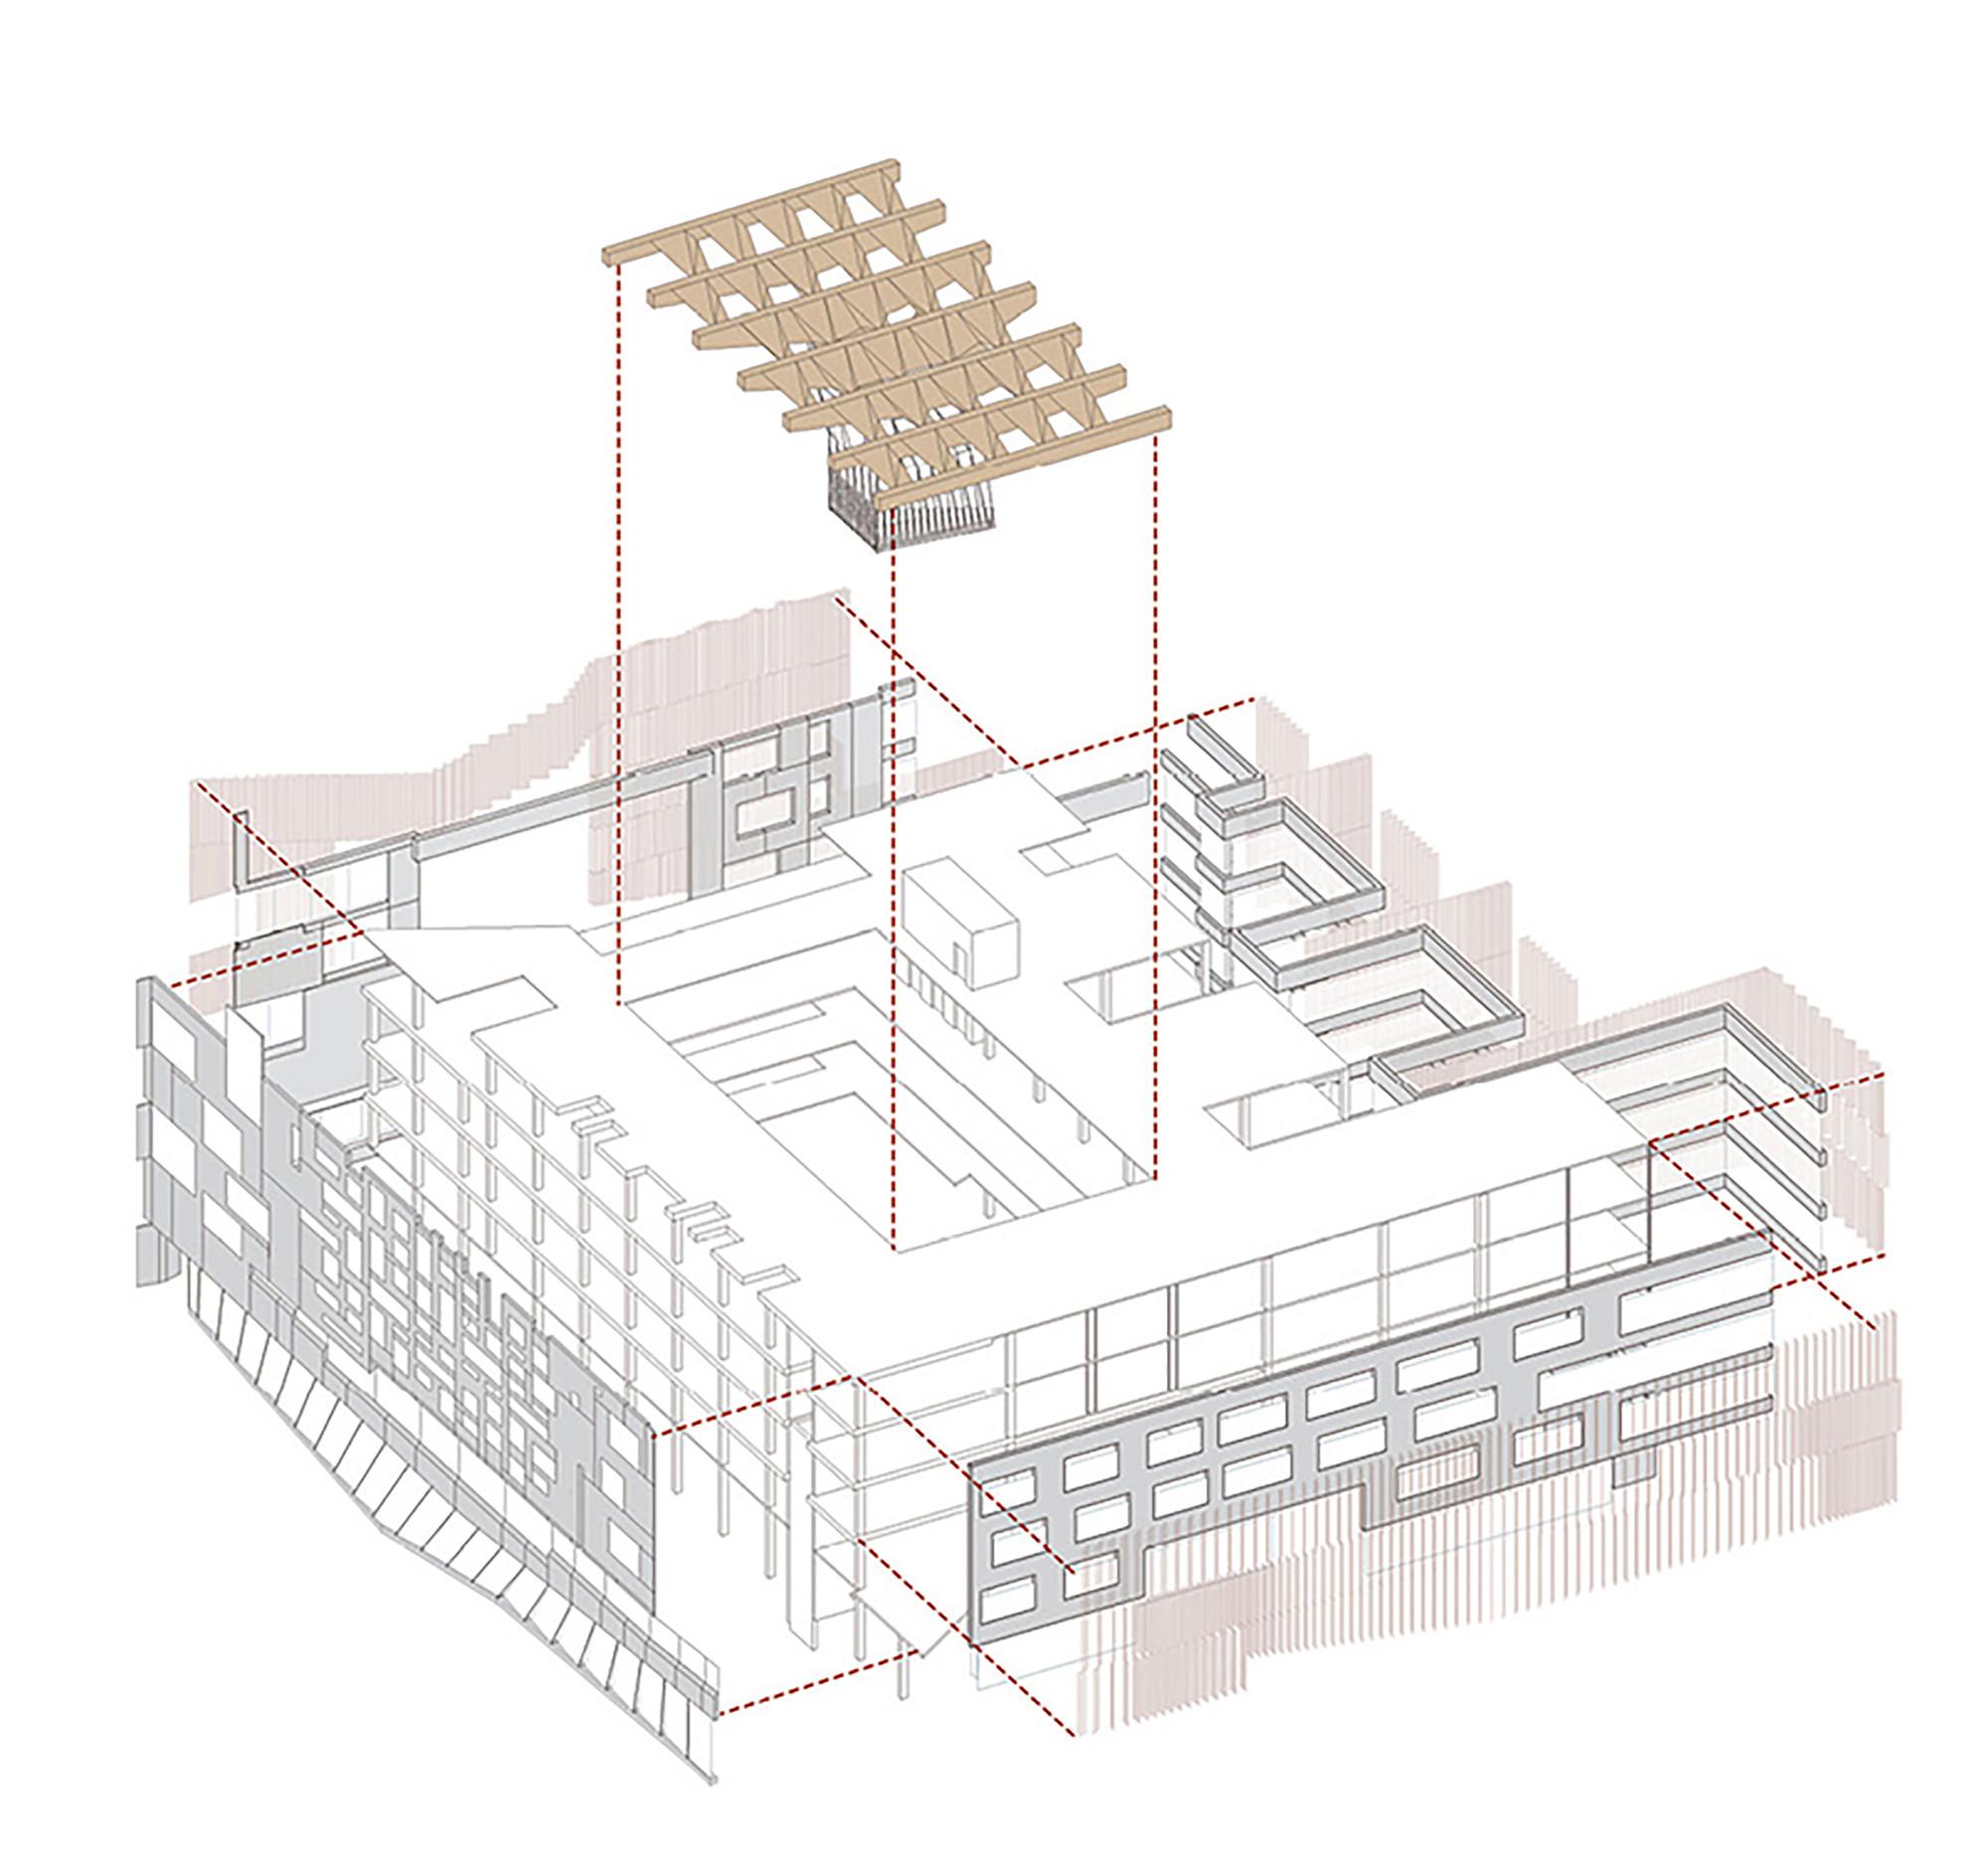 Melbourne University School Of Design Building